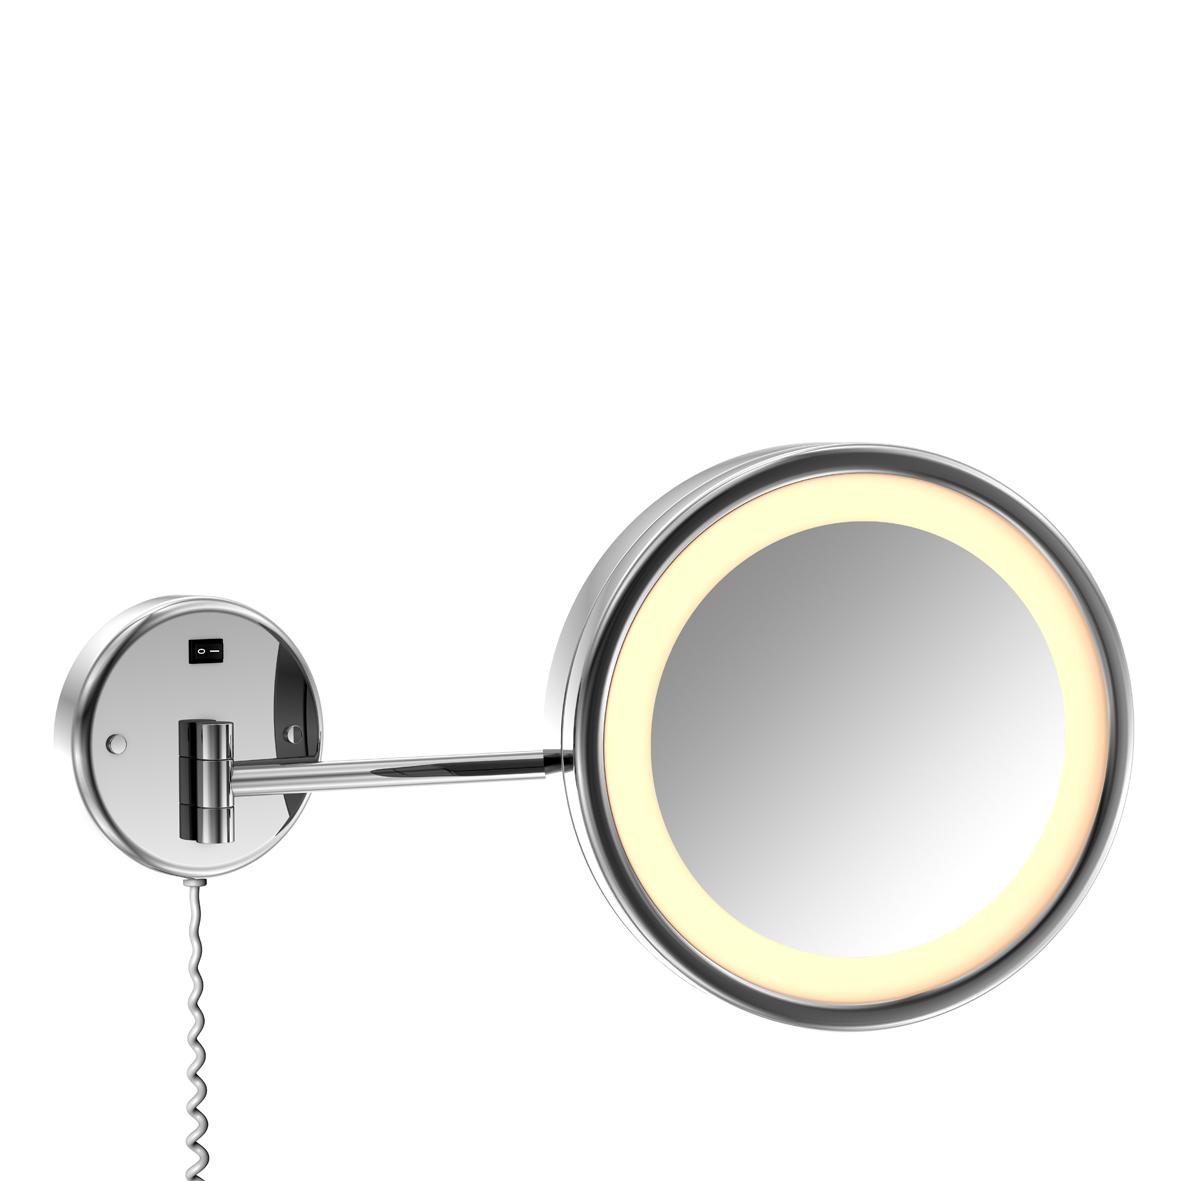 Steinberg Series 650 - Miroir cosmétique chrome